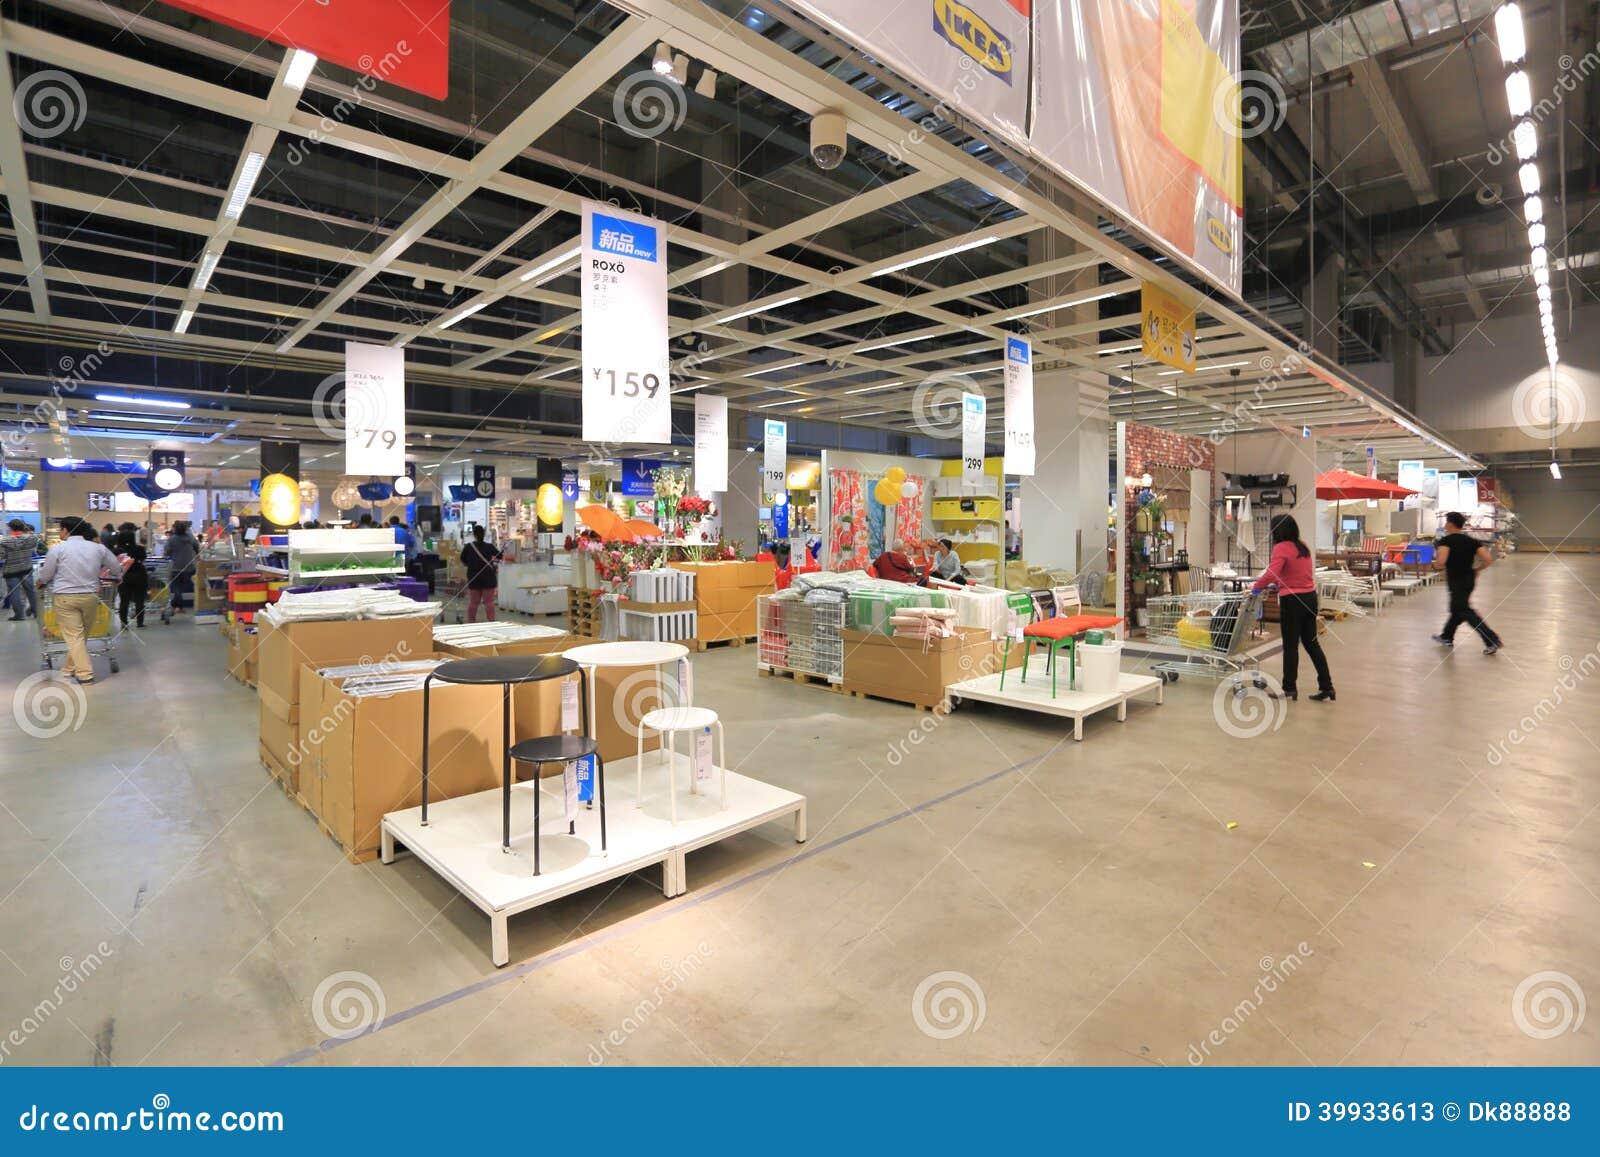 Ikea warehouse editorial stock photo image 39933613 for Ikea stehhocker